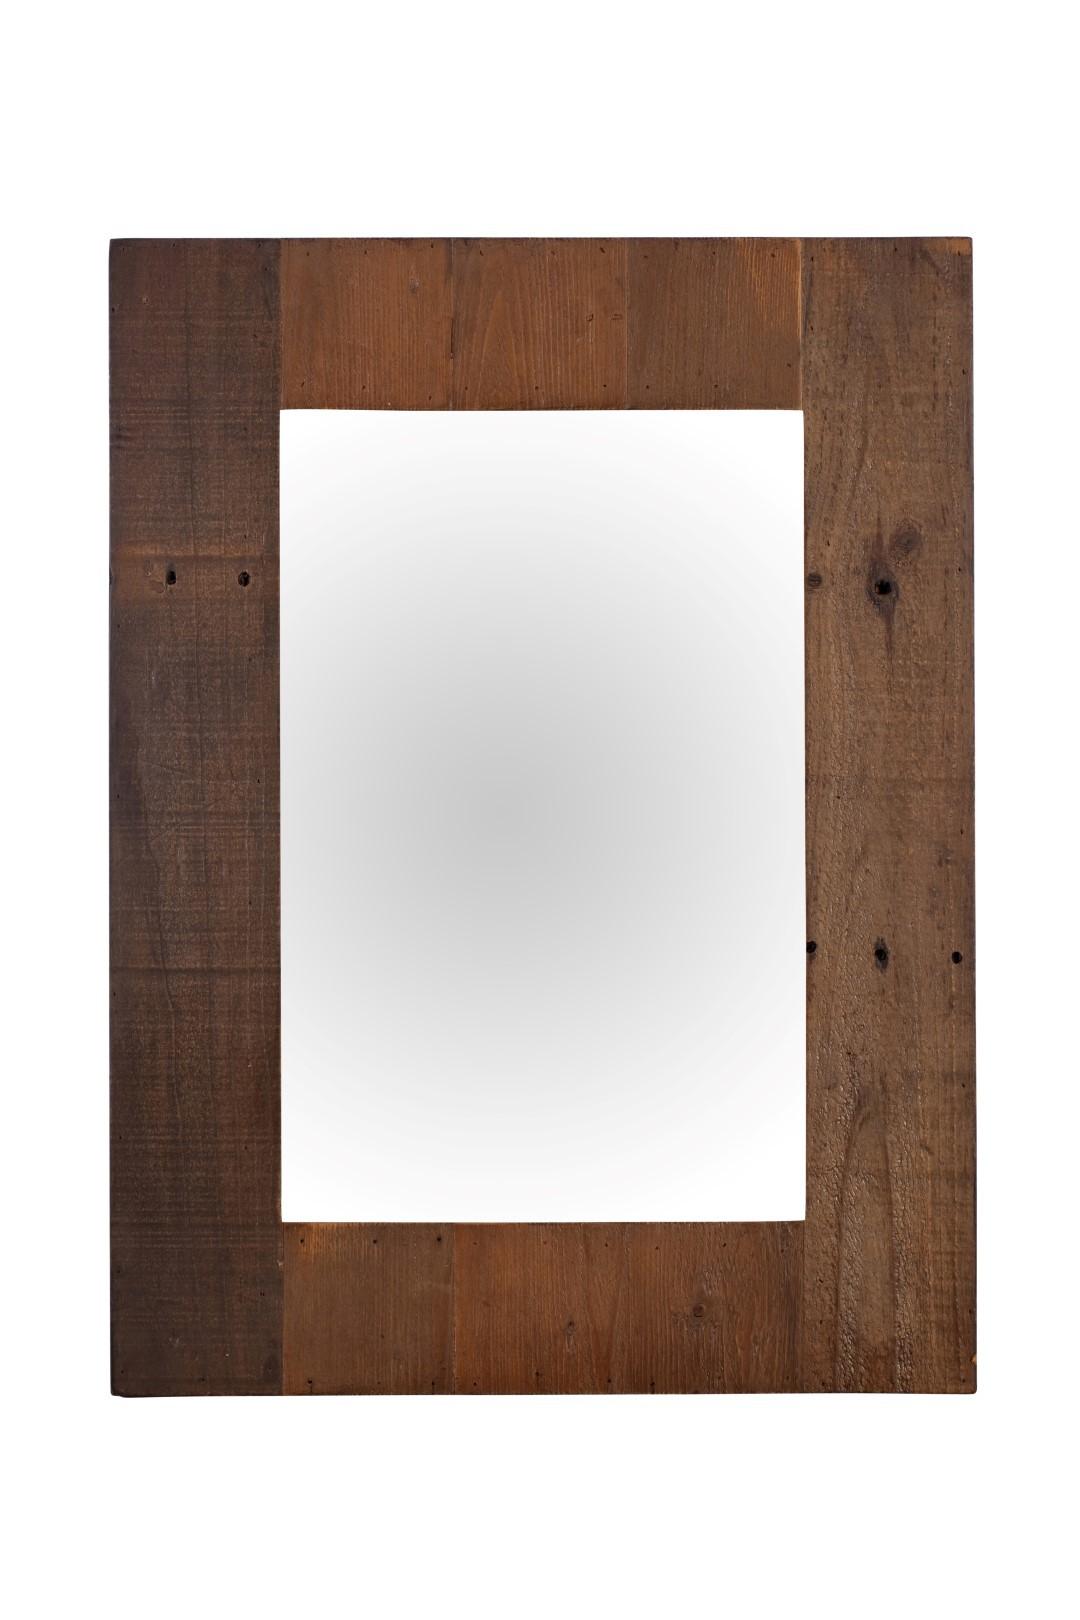 Brooklyn industrial wall mirror reclaimed solid wood for Mirror 60cm x 80cm